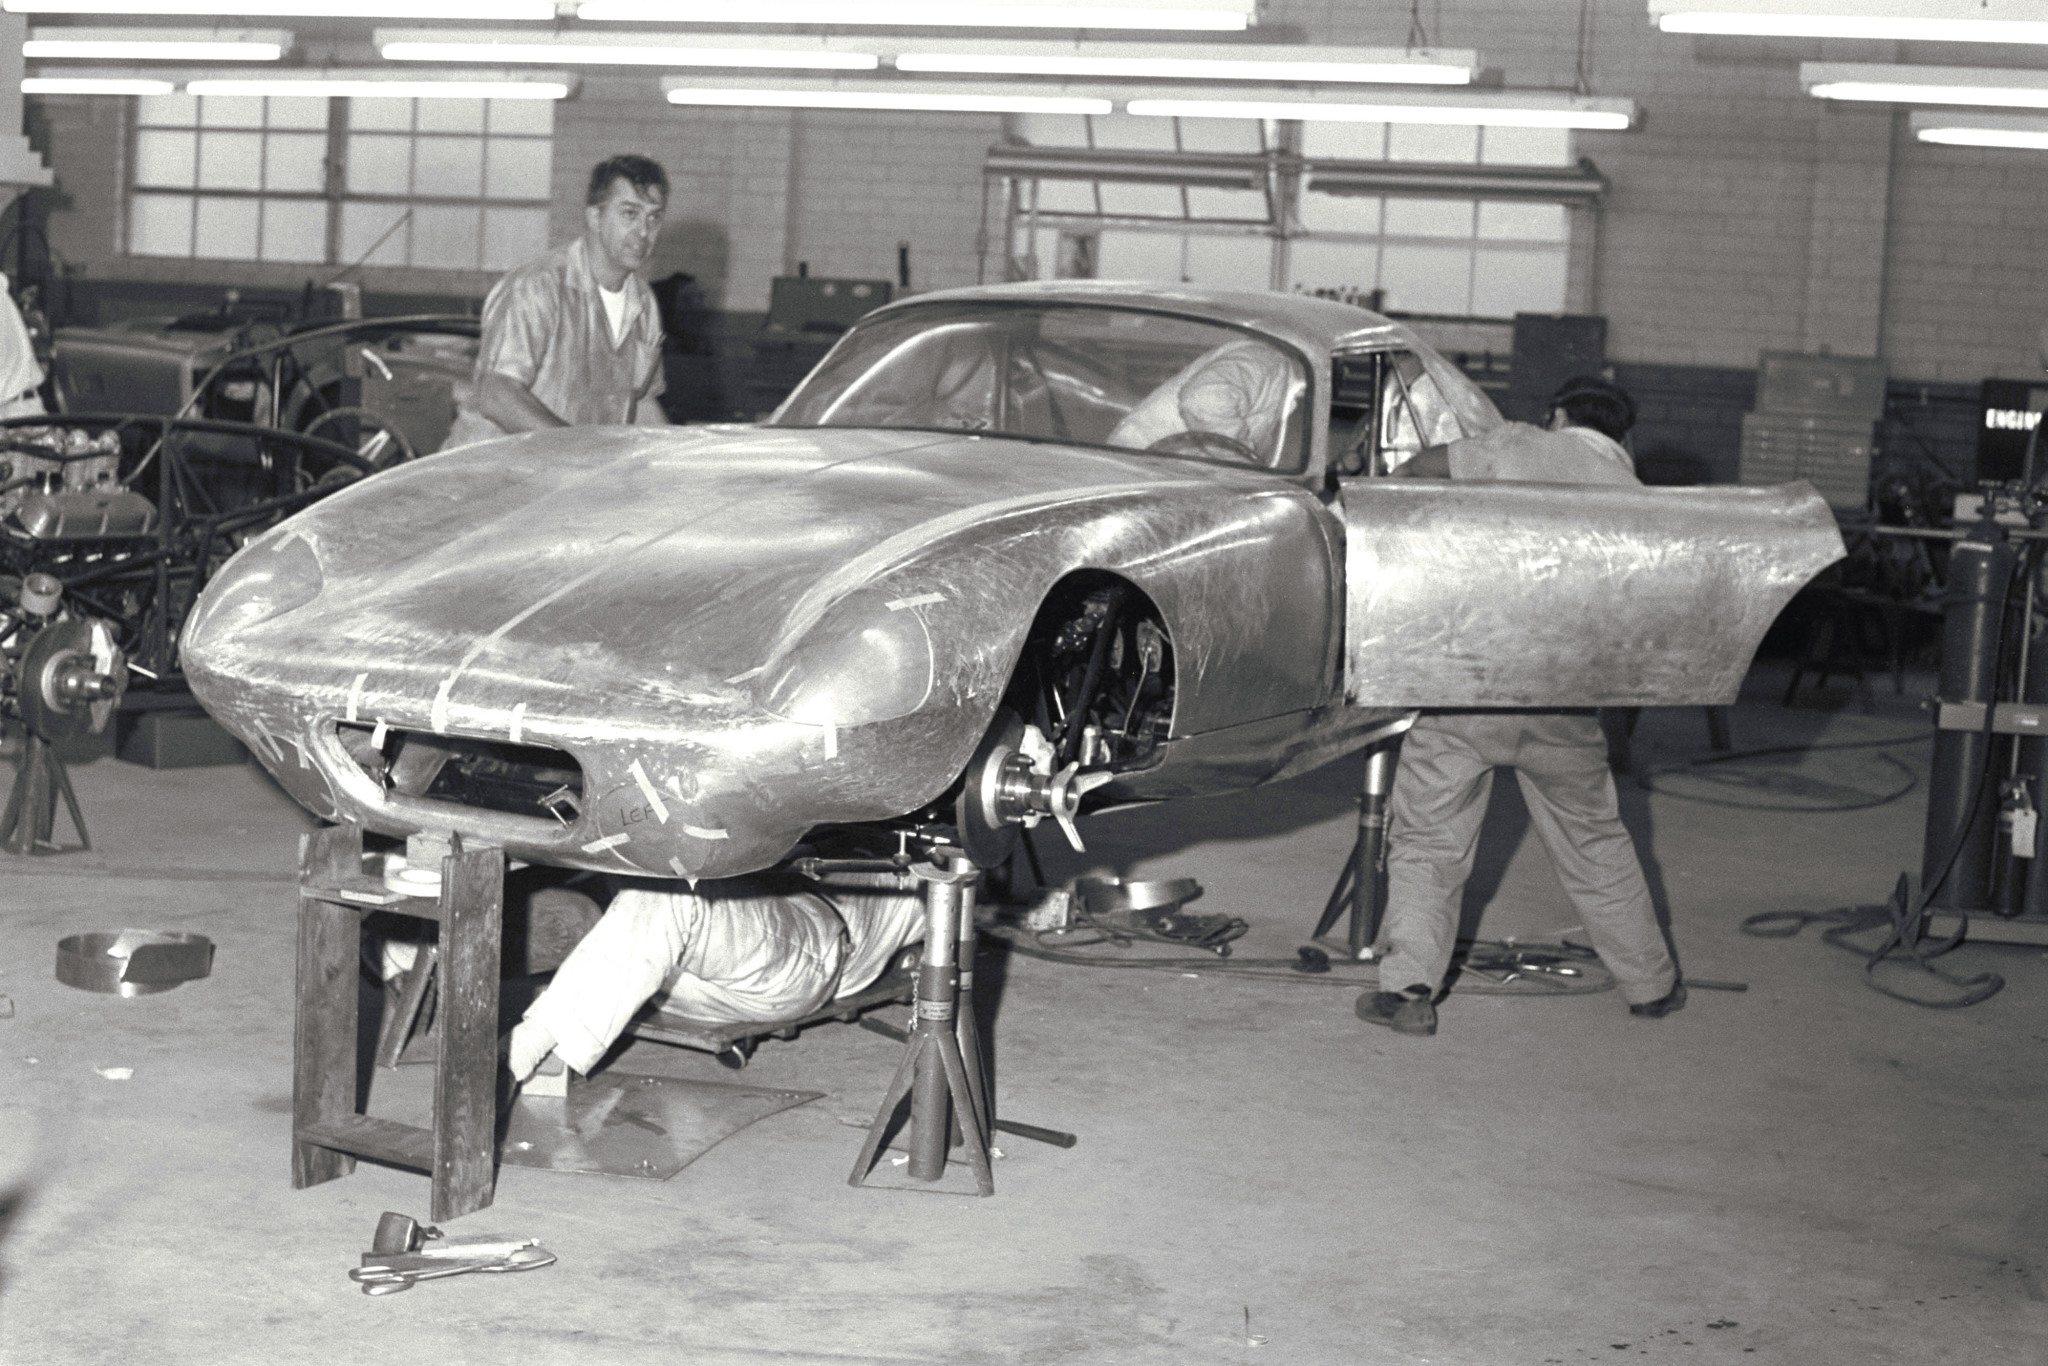 Daytona Under Construction at Shelby American